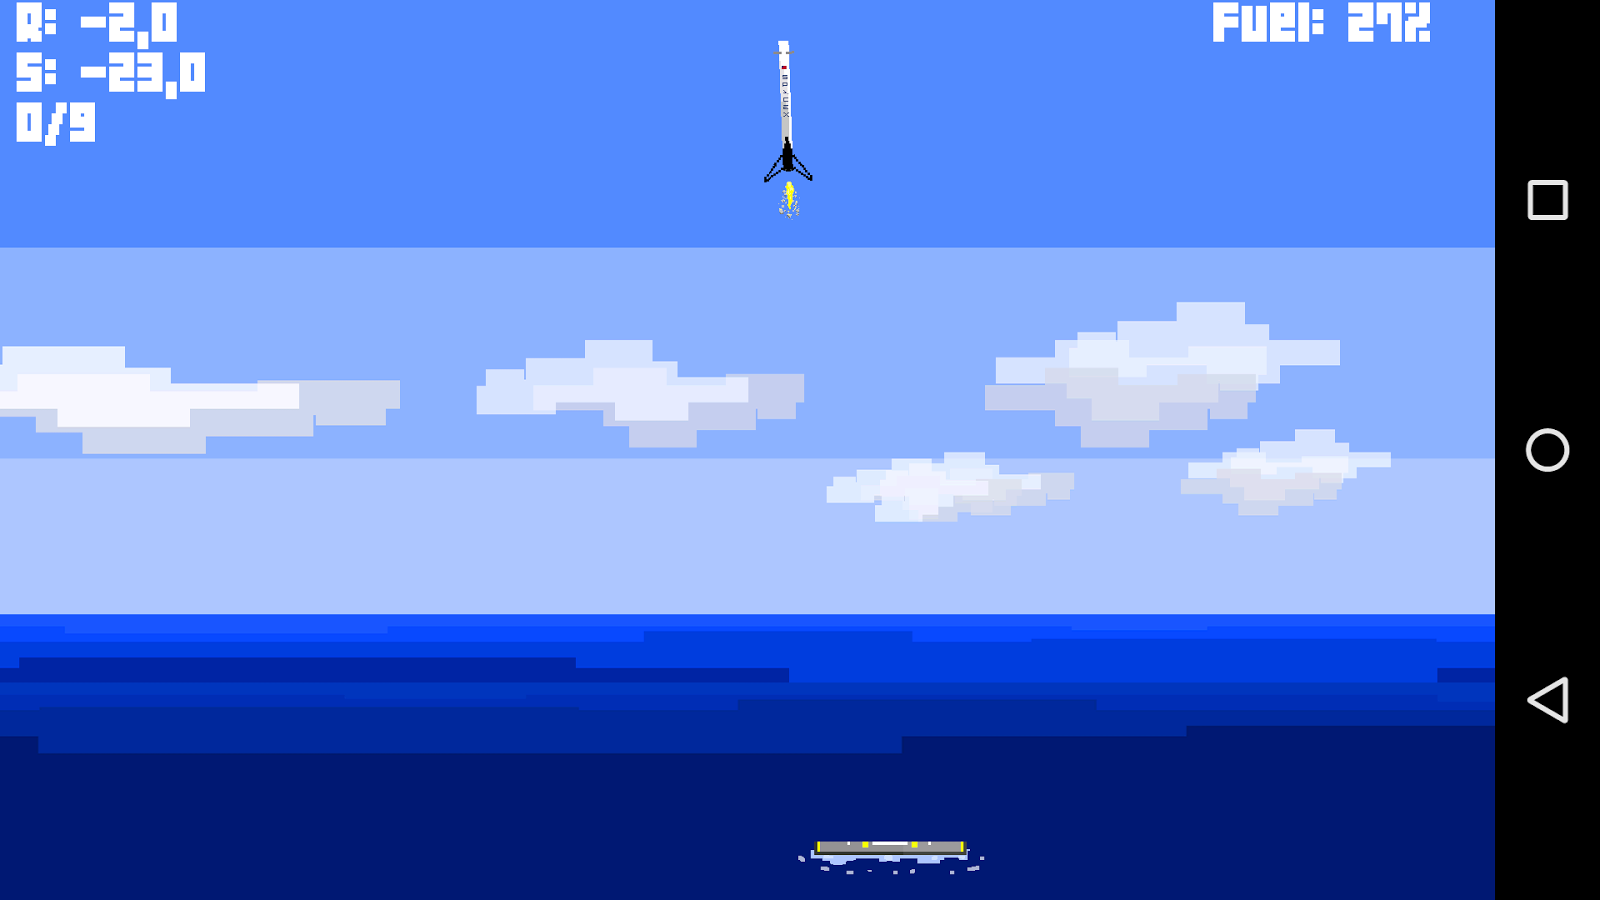 spacex falcon 9 rocket lander screenshot